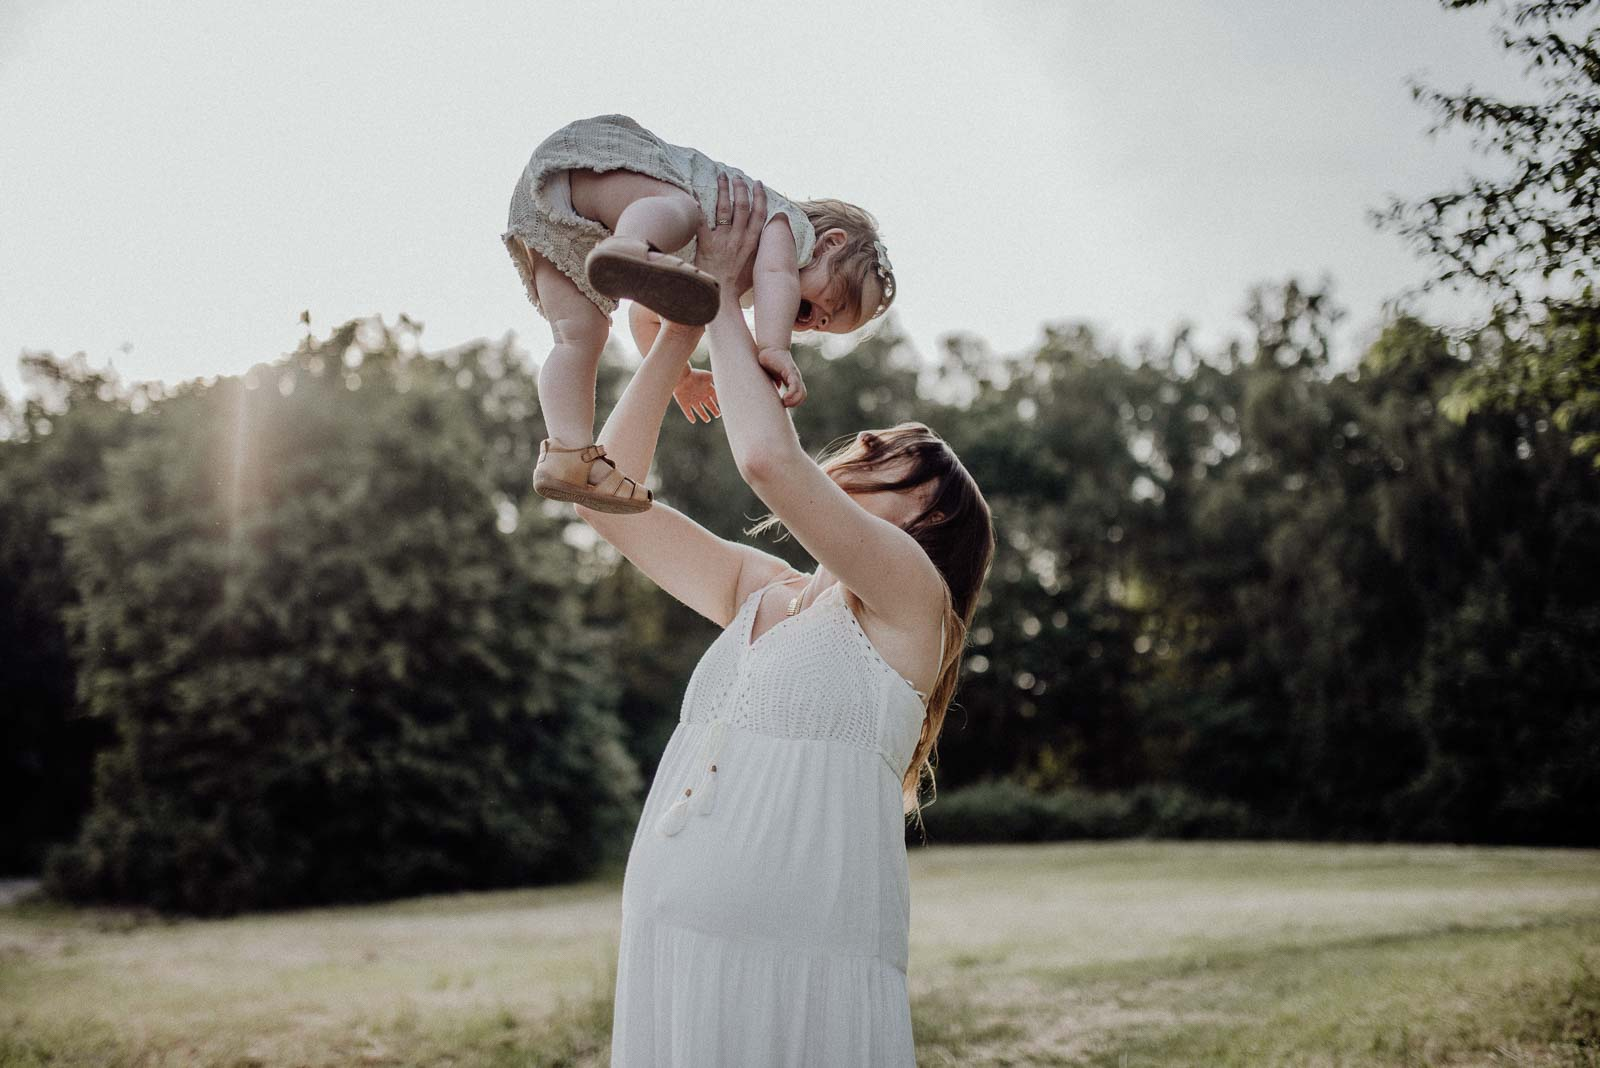 048-familien-fotoshooting-herne-heide